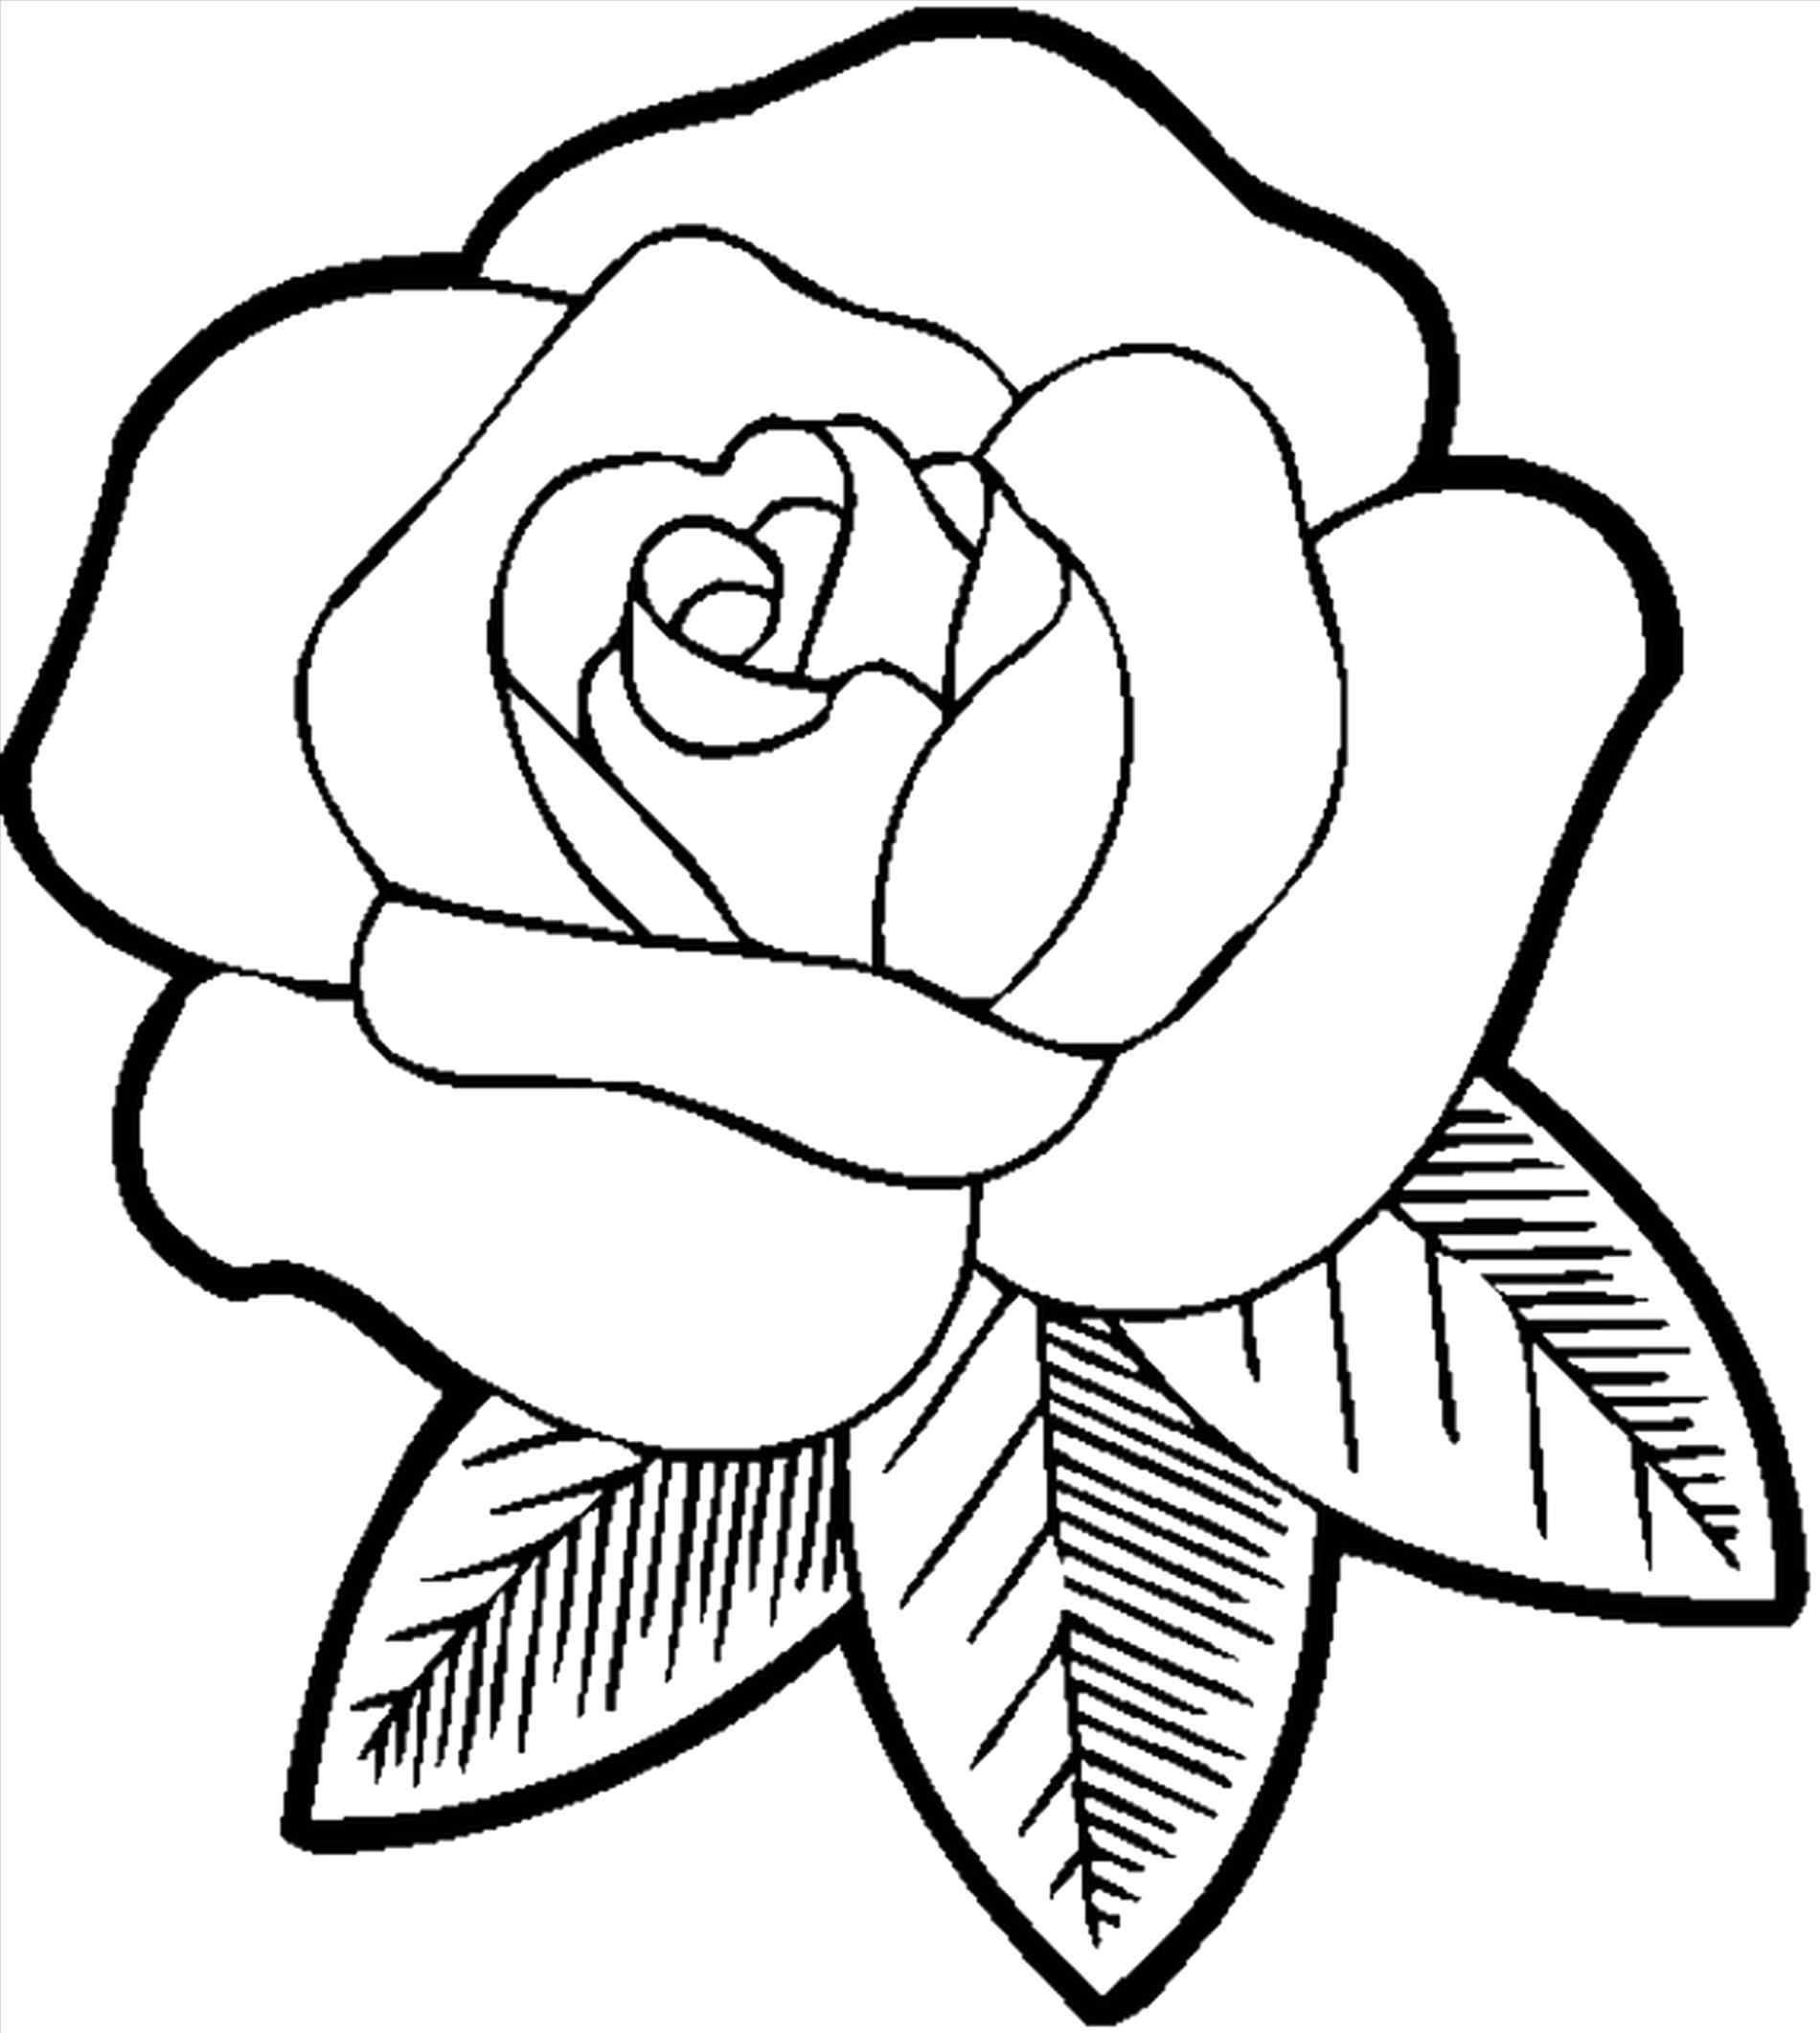 507e18e355fee2fdaec68ce448029889 » Rose Coloring Pages Easy